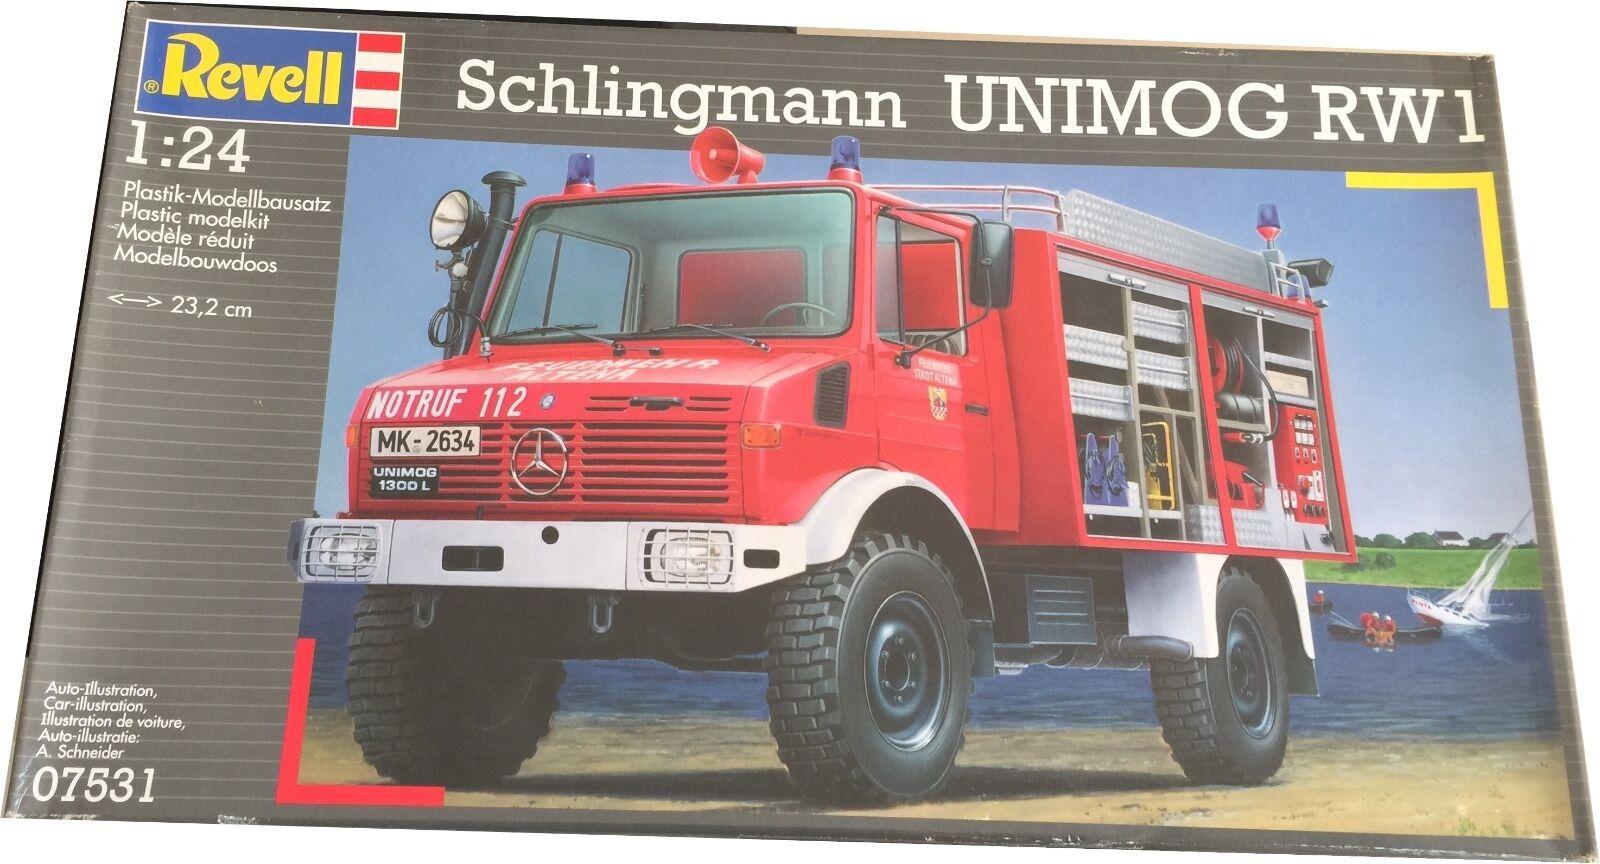 Revell Schlingmann Unimog RW1 Model Kit Ref 07531 Escala 1 24, Nuevo (Leer Desc)